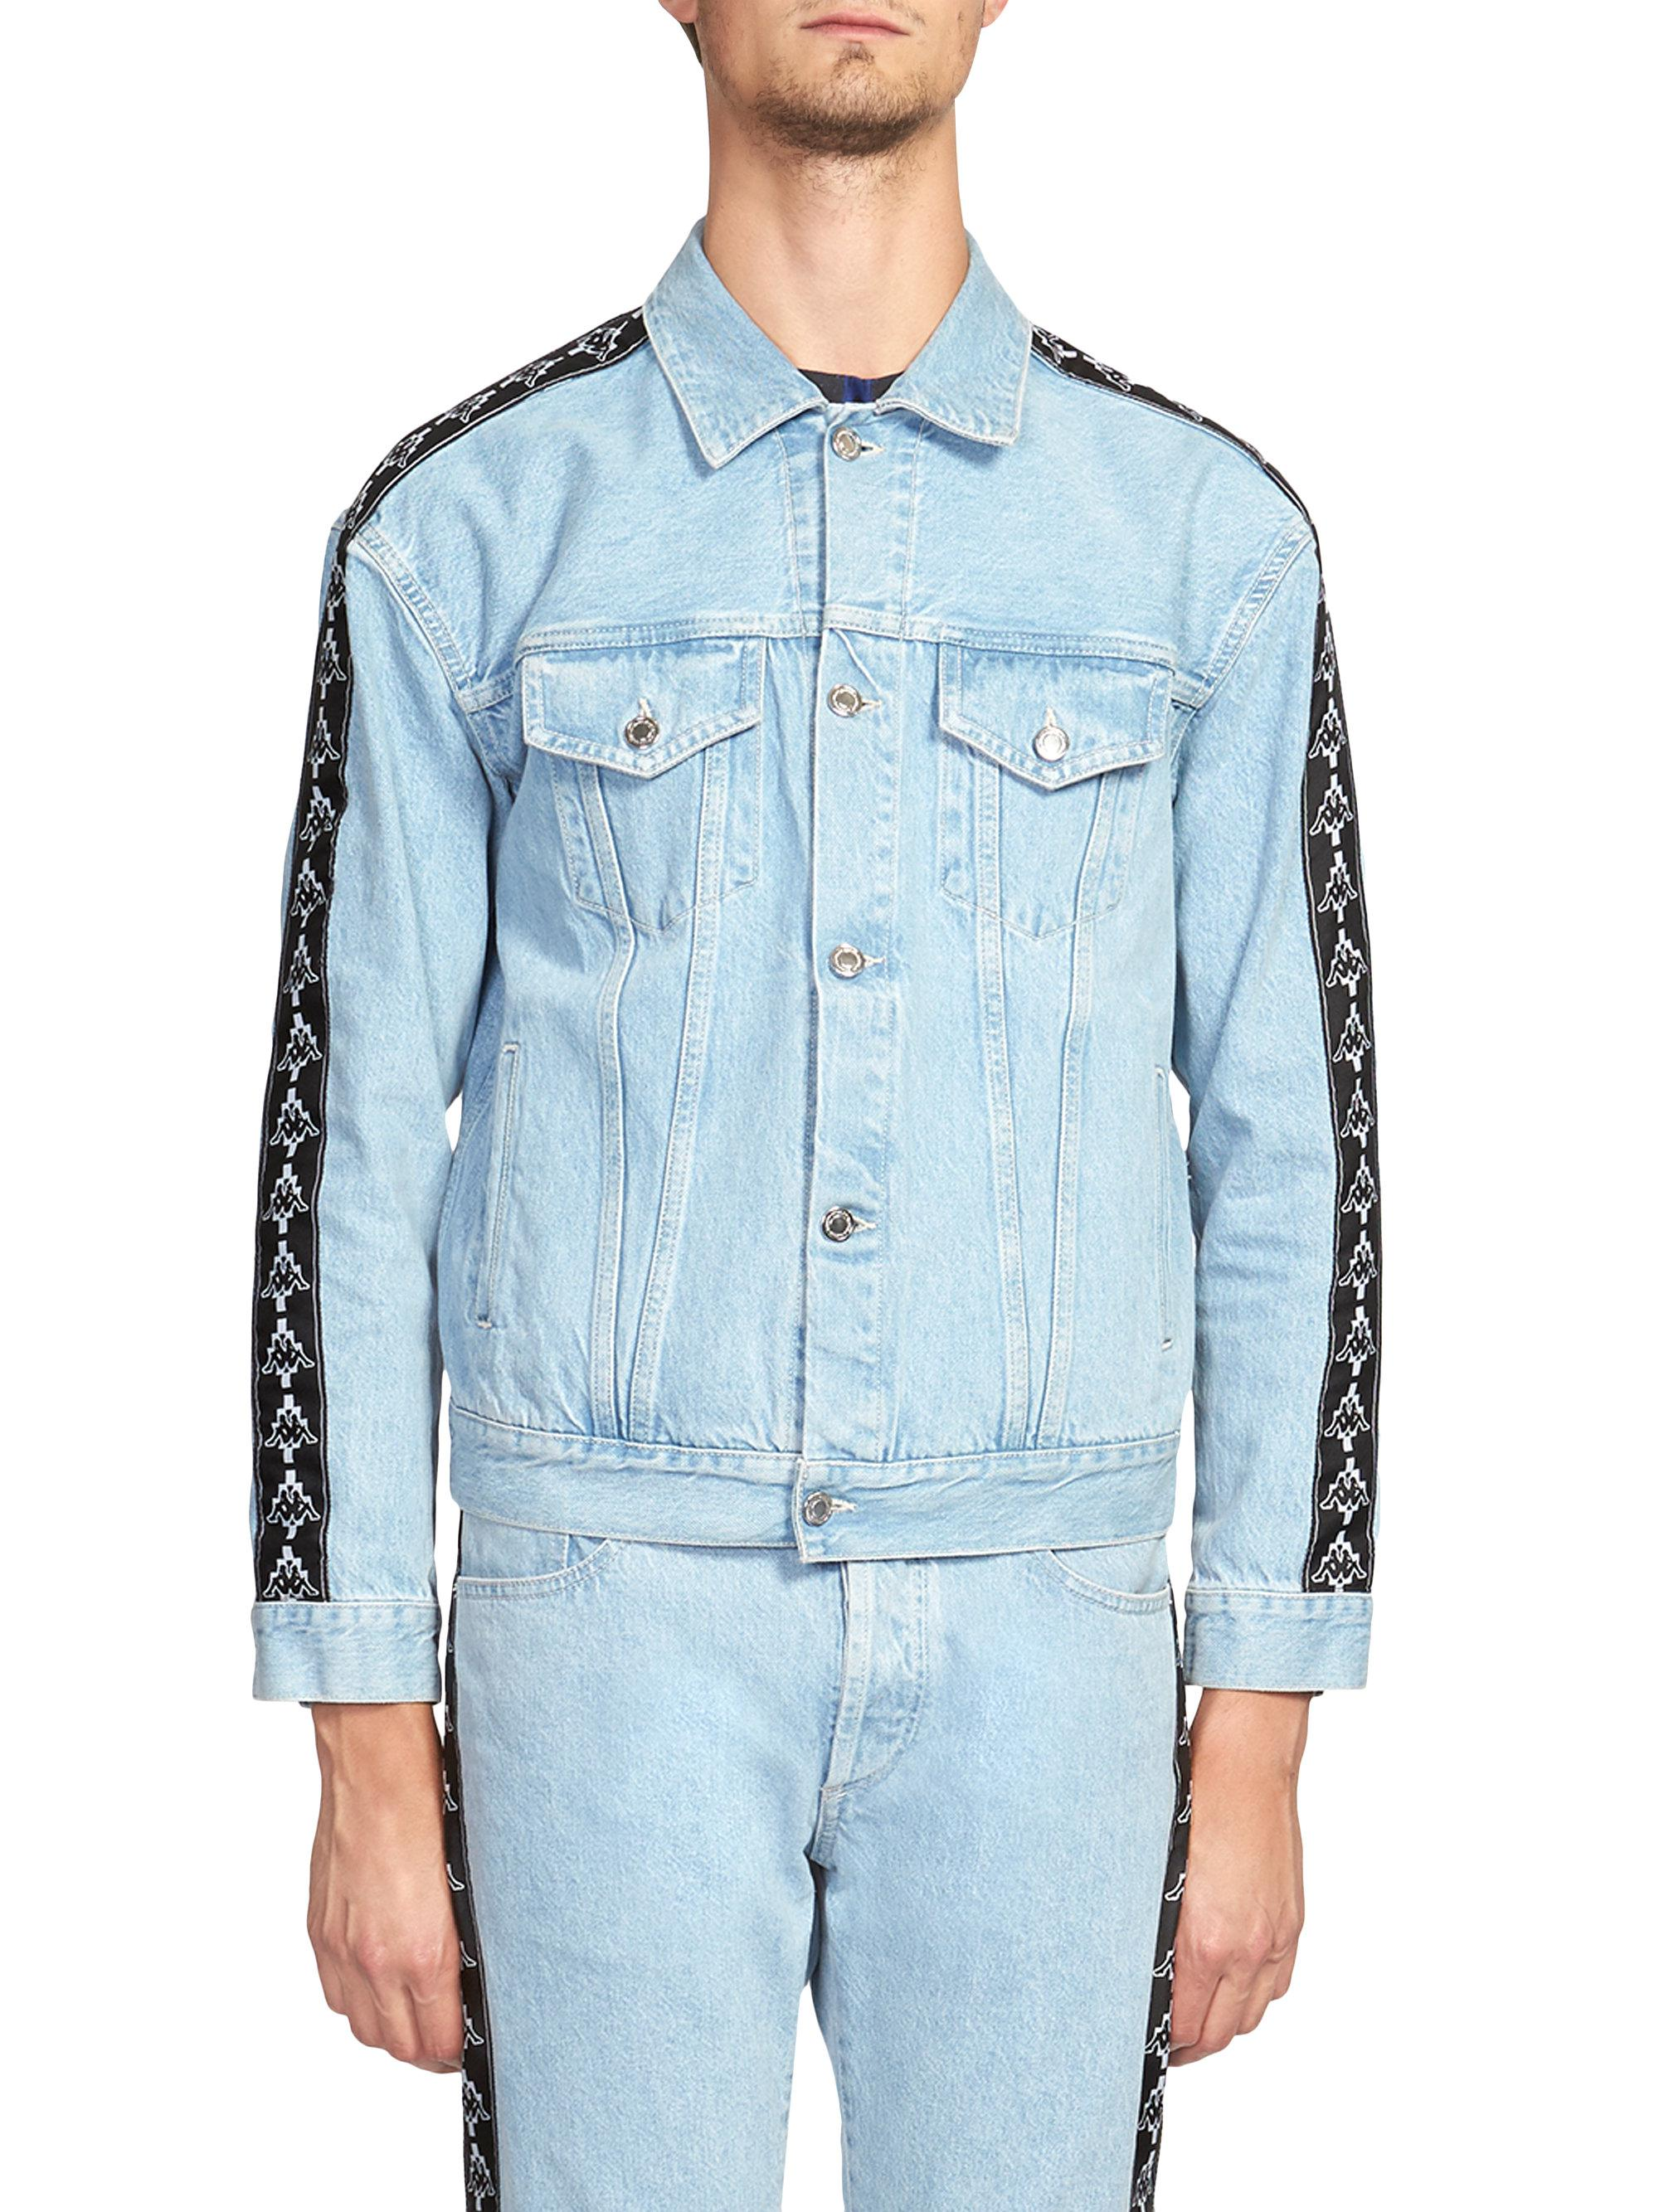 Marcelo Burlon. Men's Blue Kappa Denim Jacket